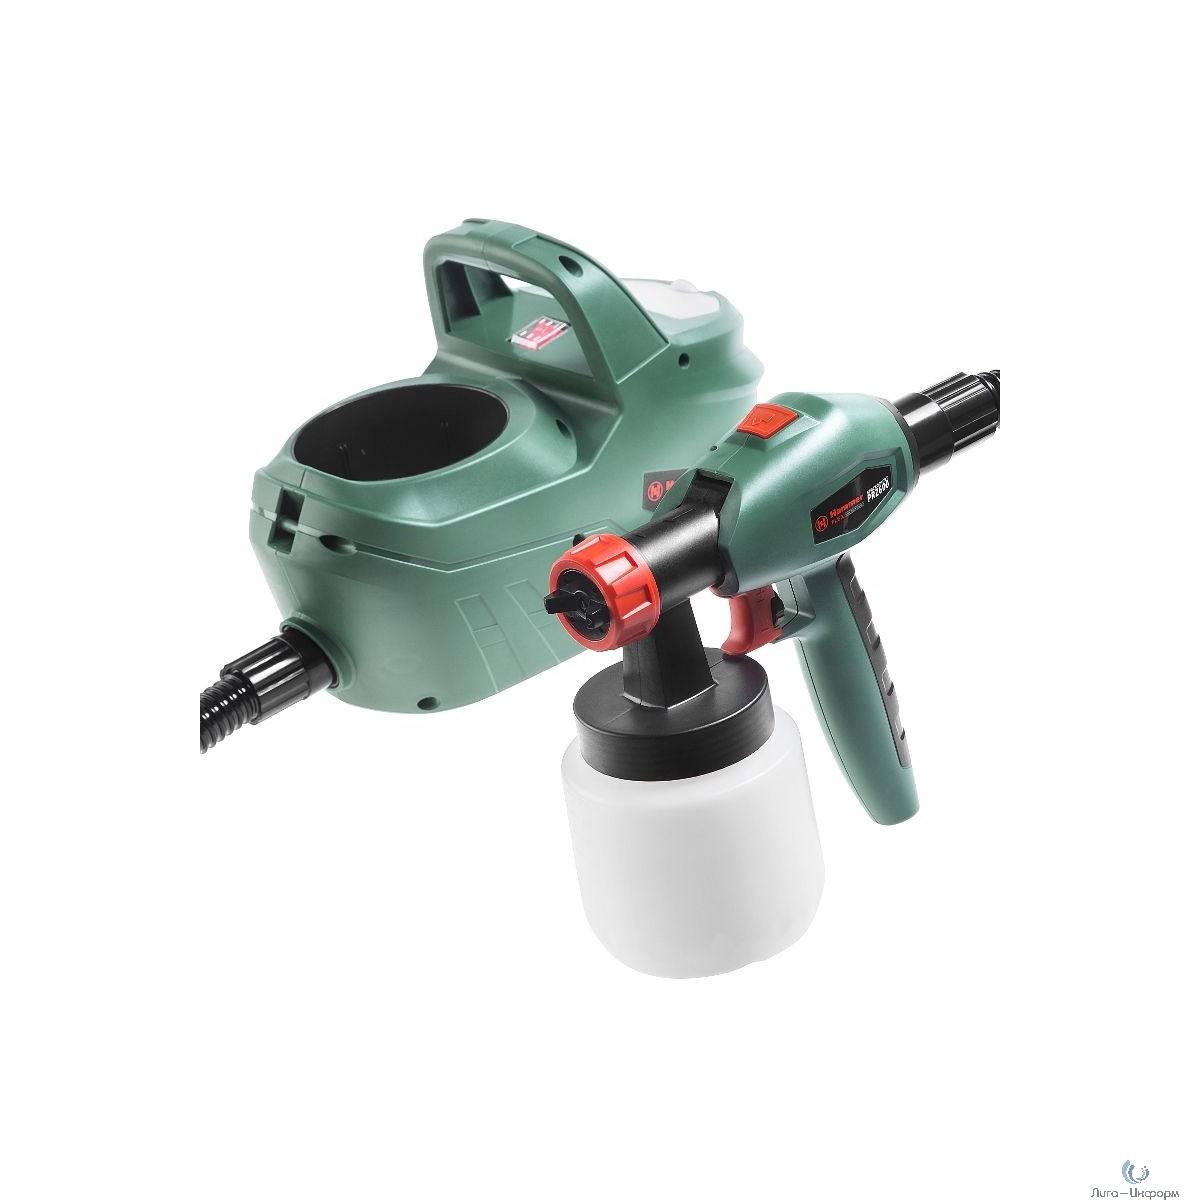 Hammer Flex PRZ600 Краскопульт [215276] {600Вт 0-800мл/мин 800мл бак, вязкость до 100 DIN} 146-009